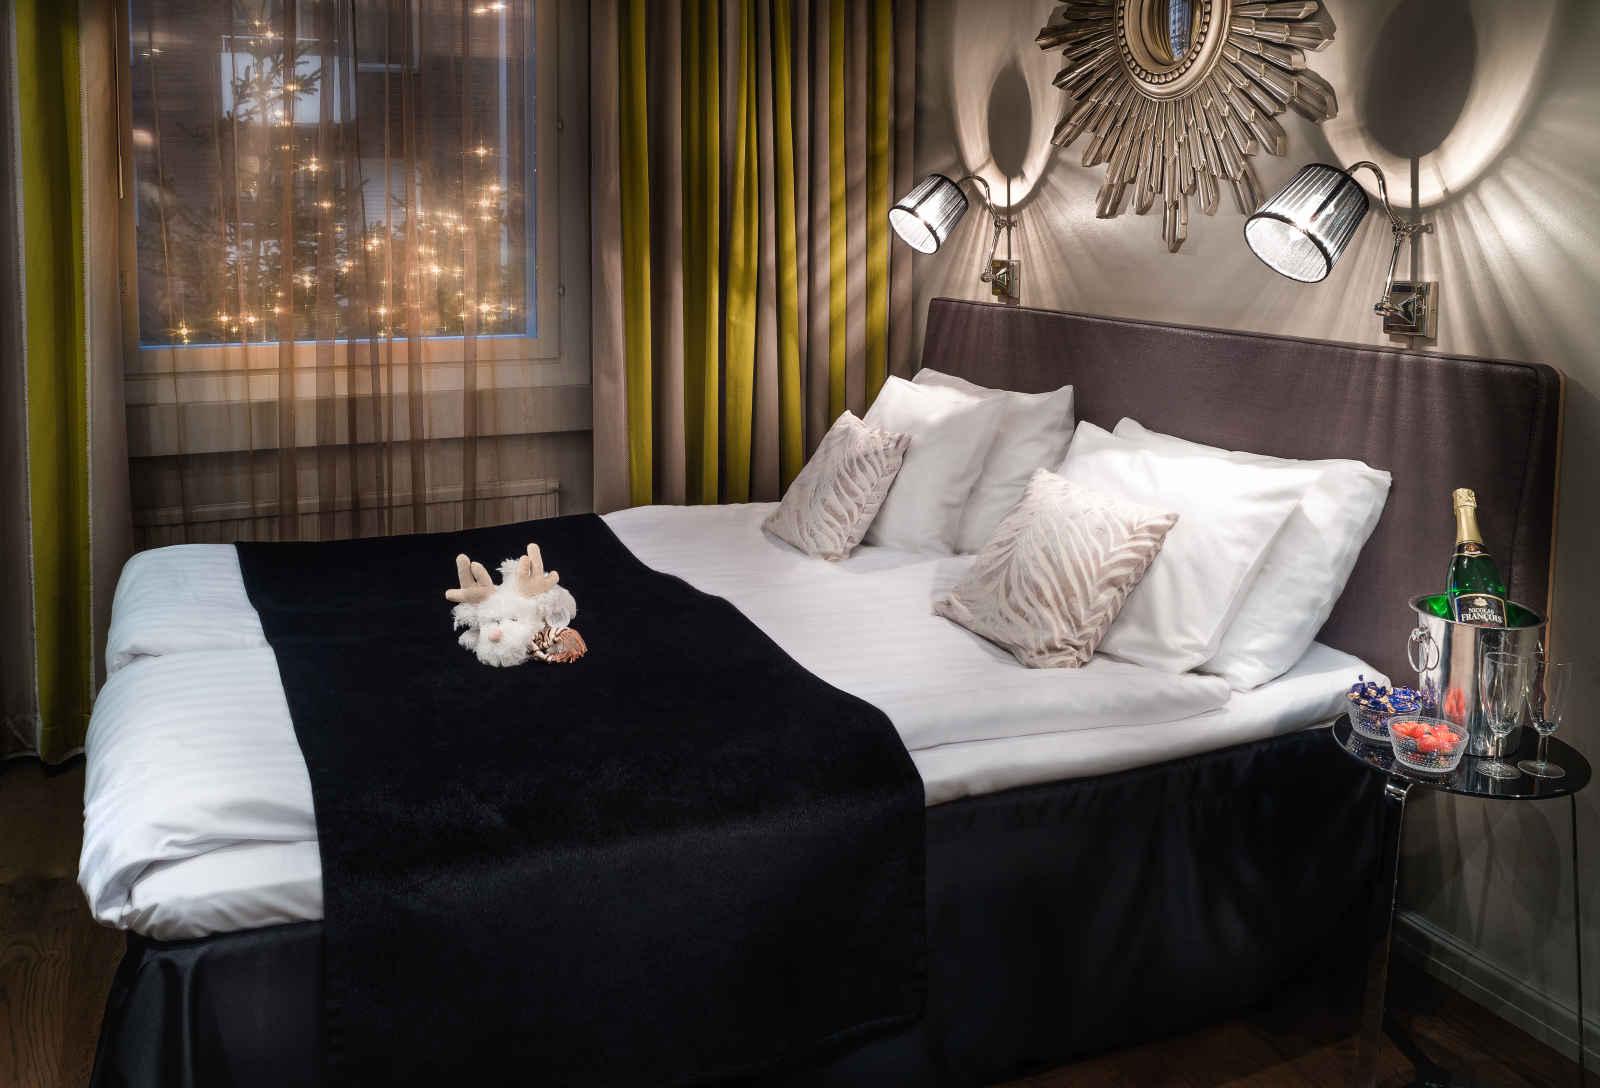 Arctic City hotel - 8 jours / 7 nuits